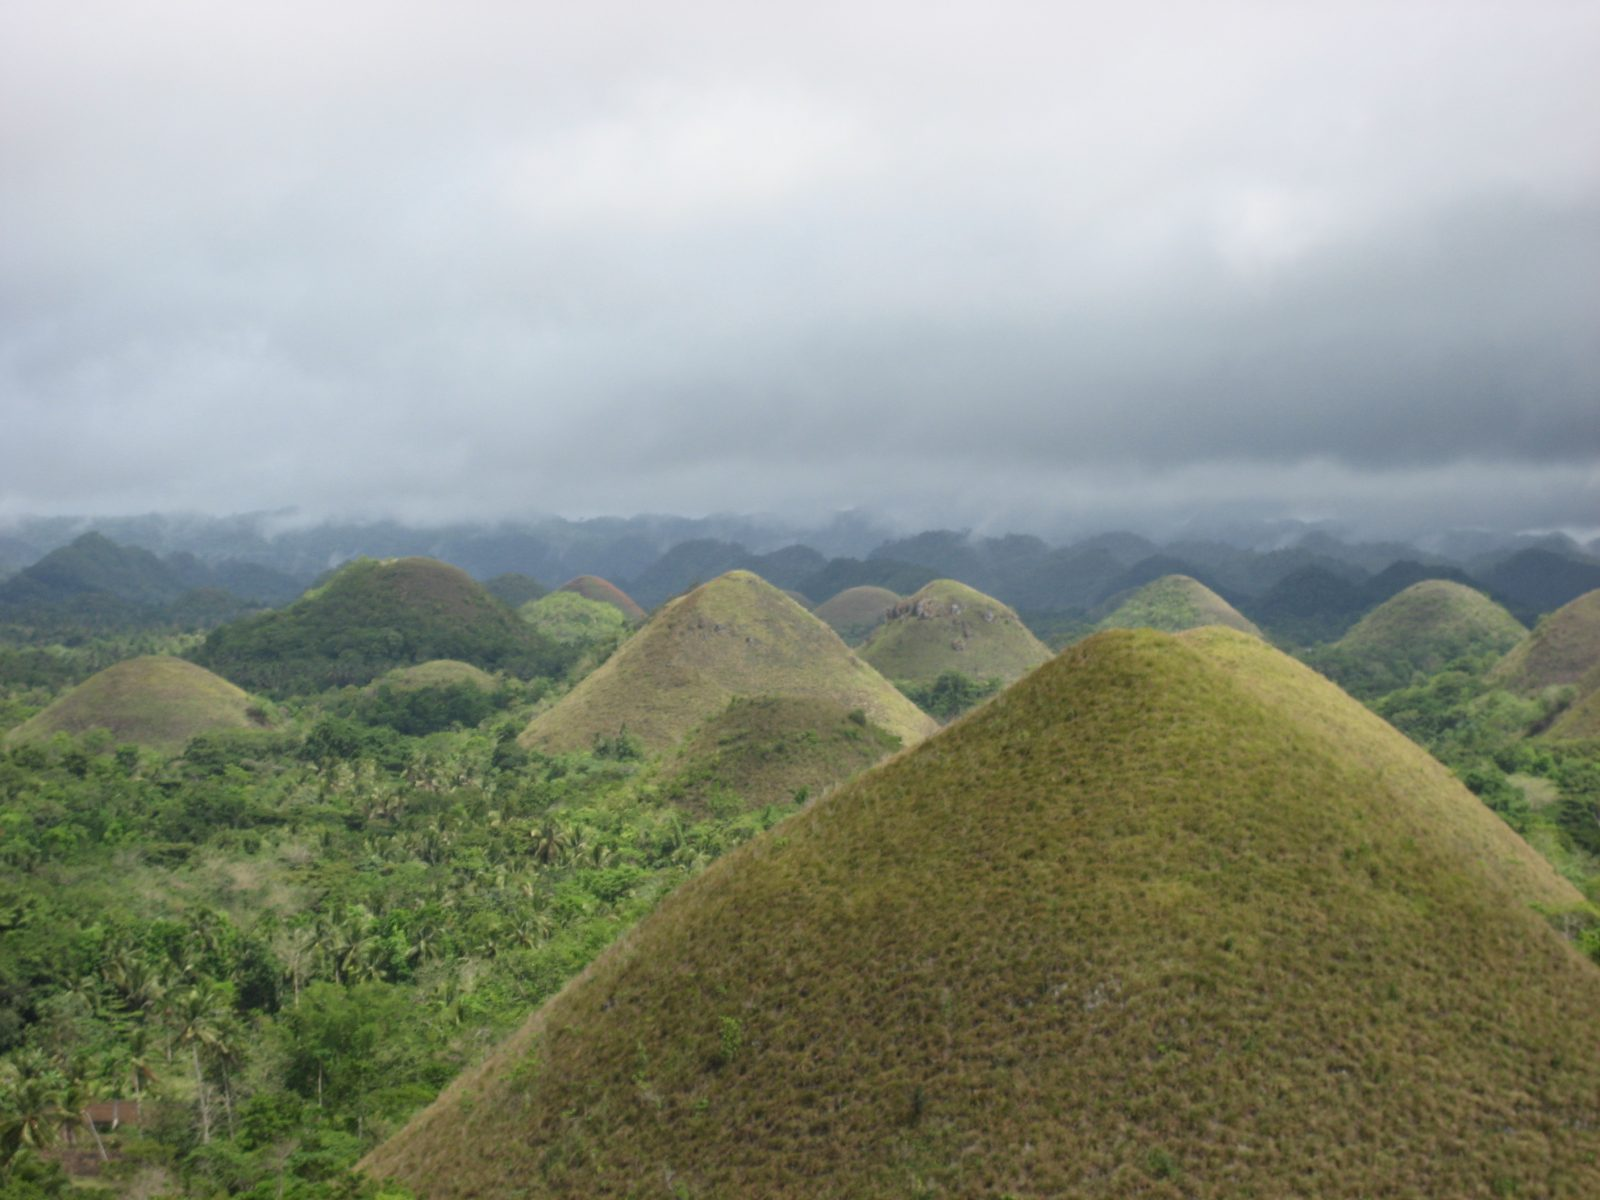 Chocolate Hills of Bohol, Philippines